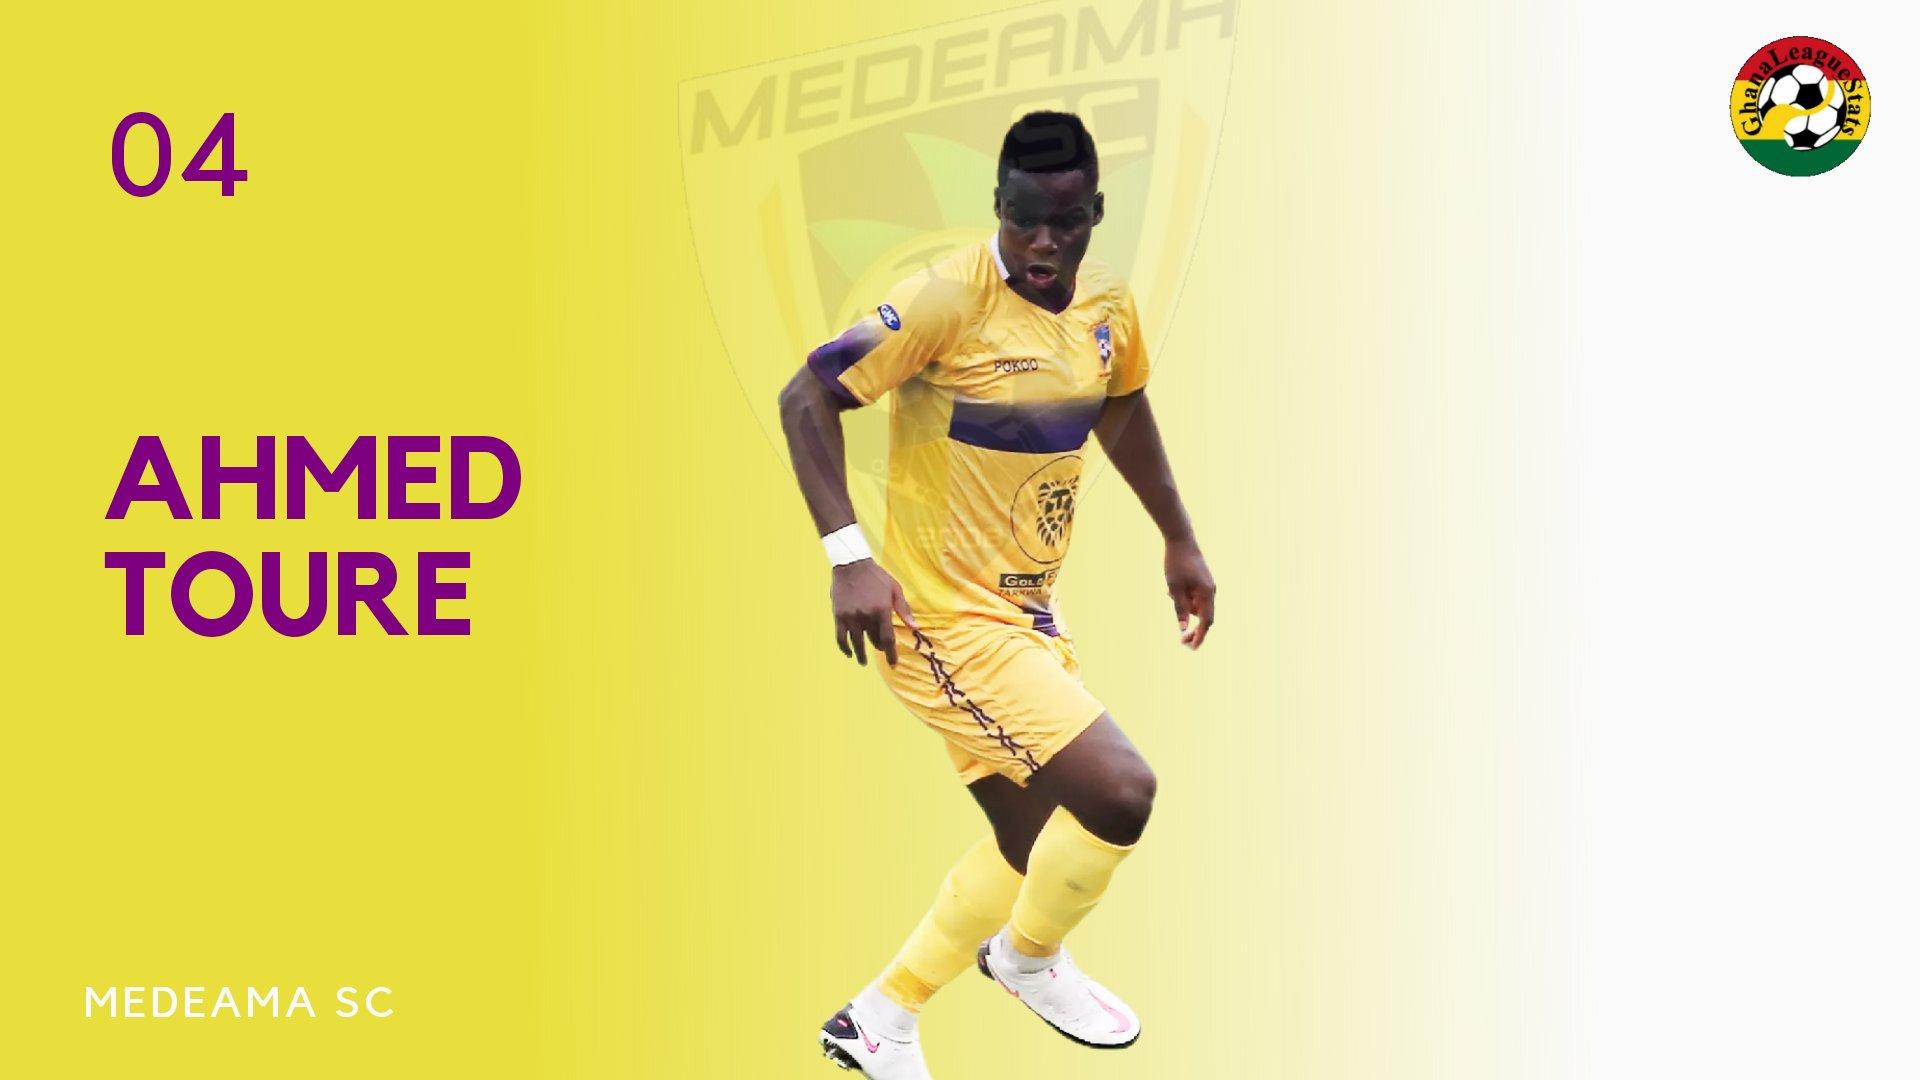 2020/21 Ghana Premier League: Medeama striker Amed Toure to miss Legon Cities tie